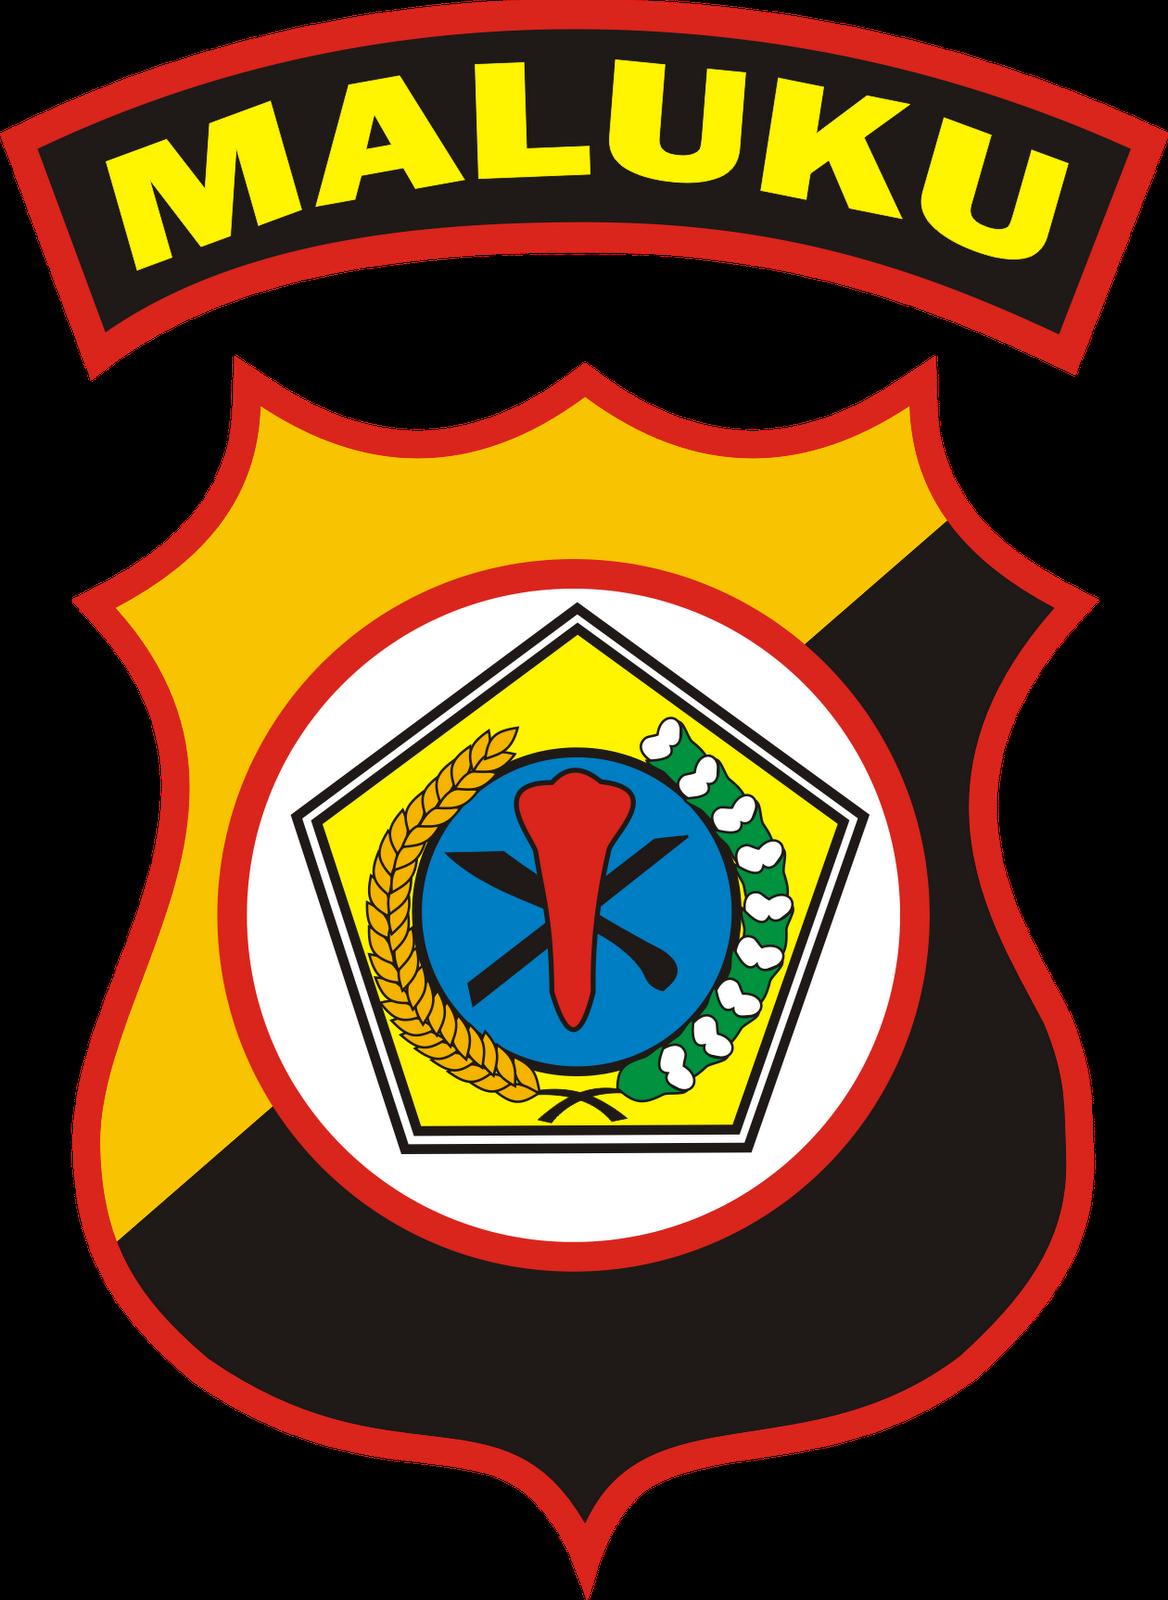 Kepolisian Daerah Maluku Wikipedia Bahasa Indonesia Ensiklopedia Bebas